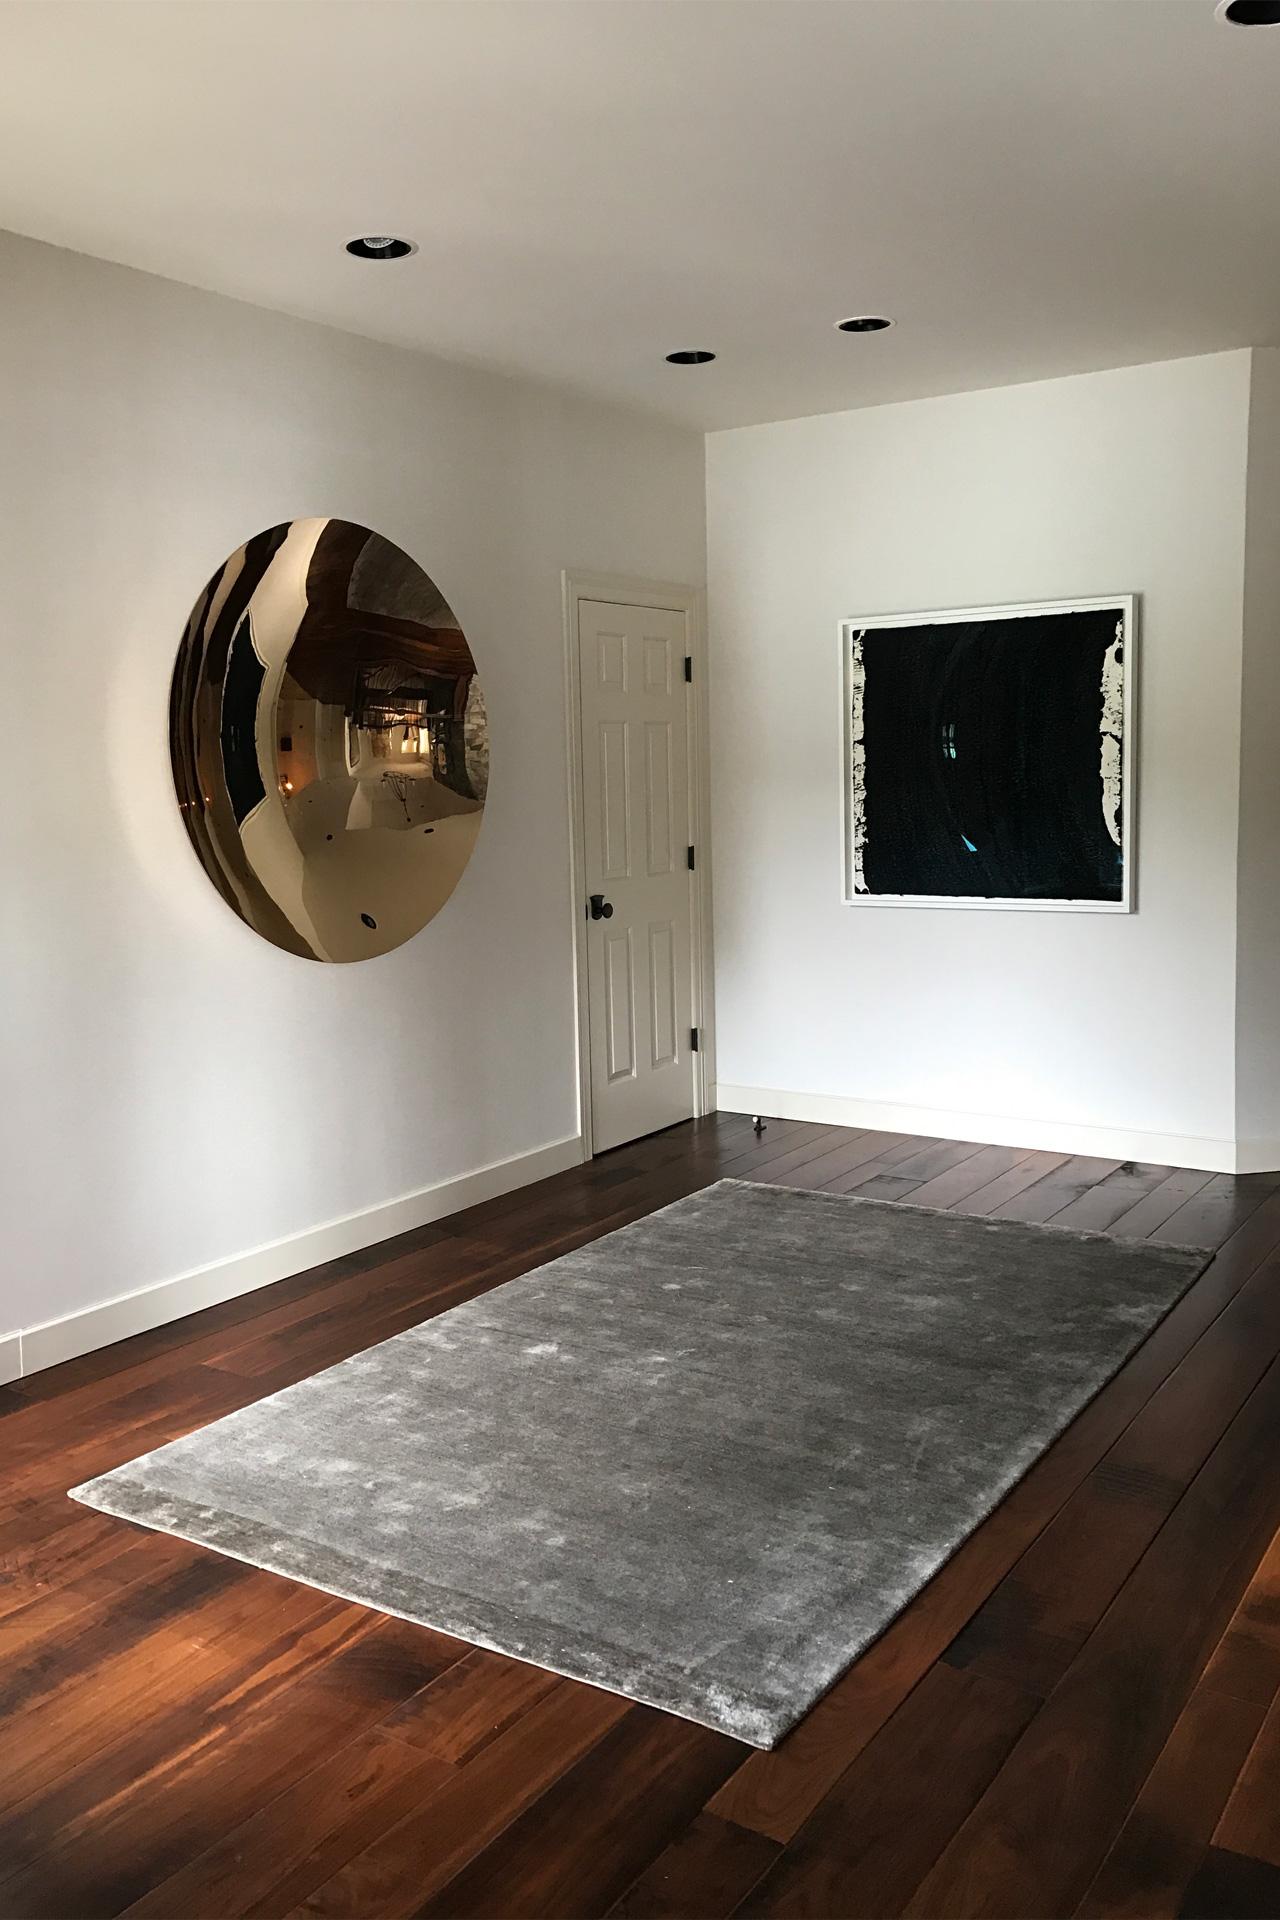 pfi-gallery-2017-3959